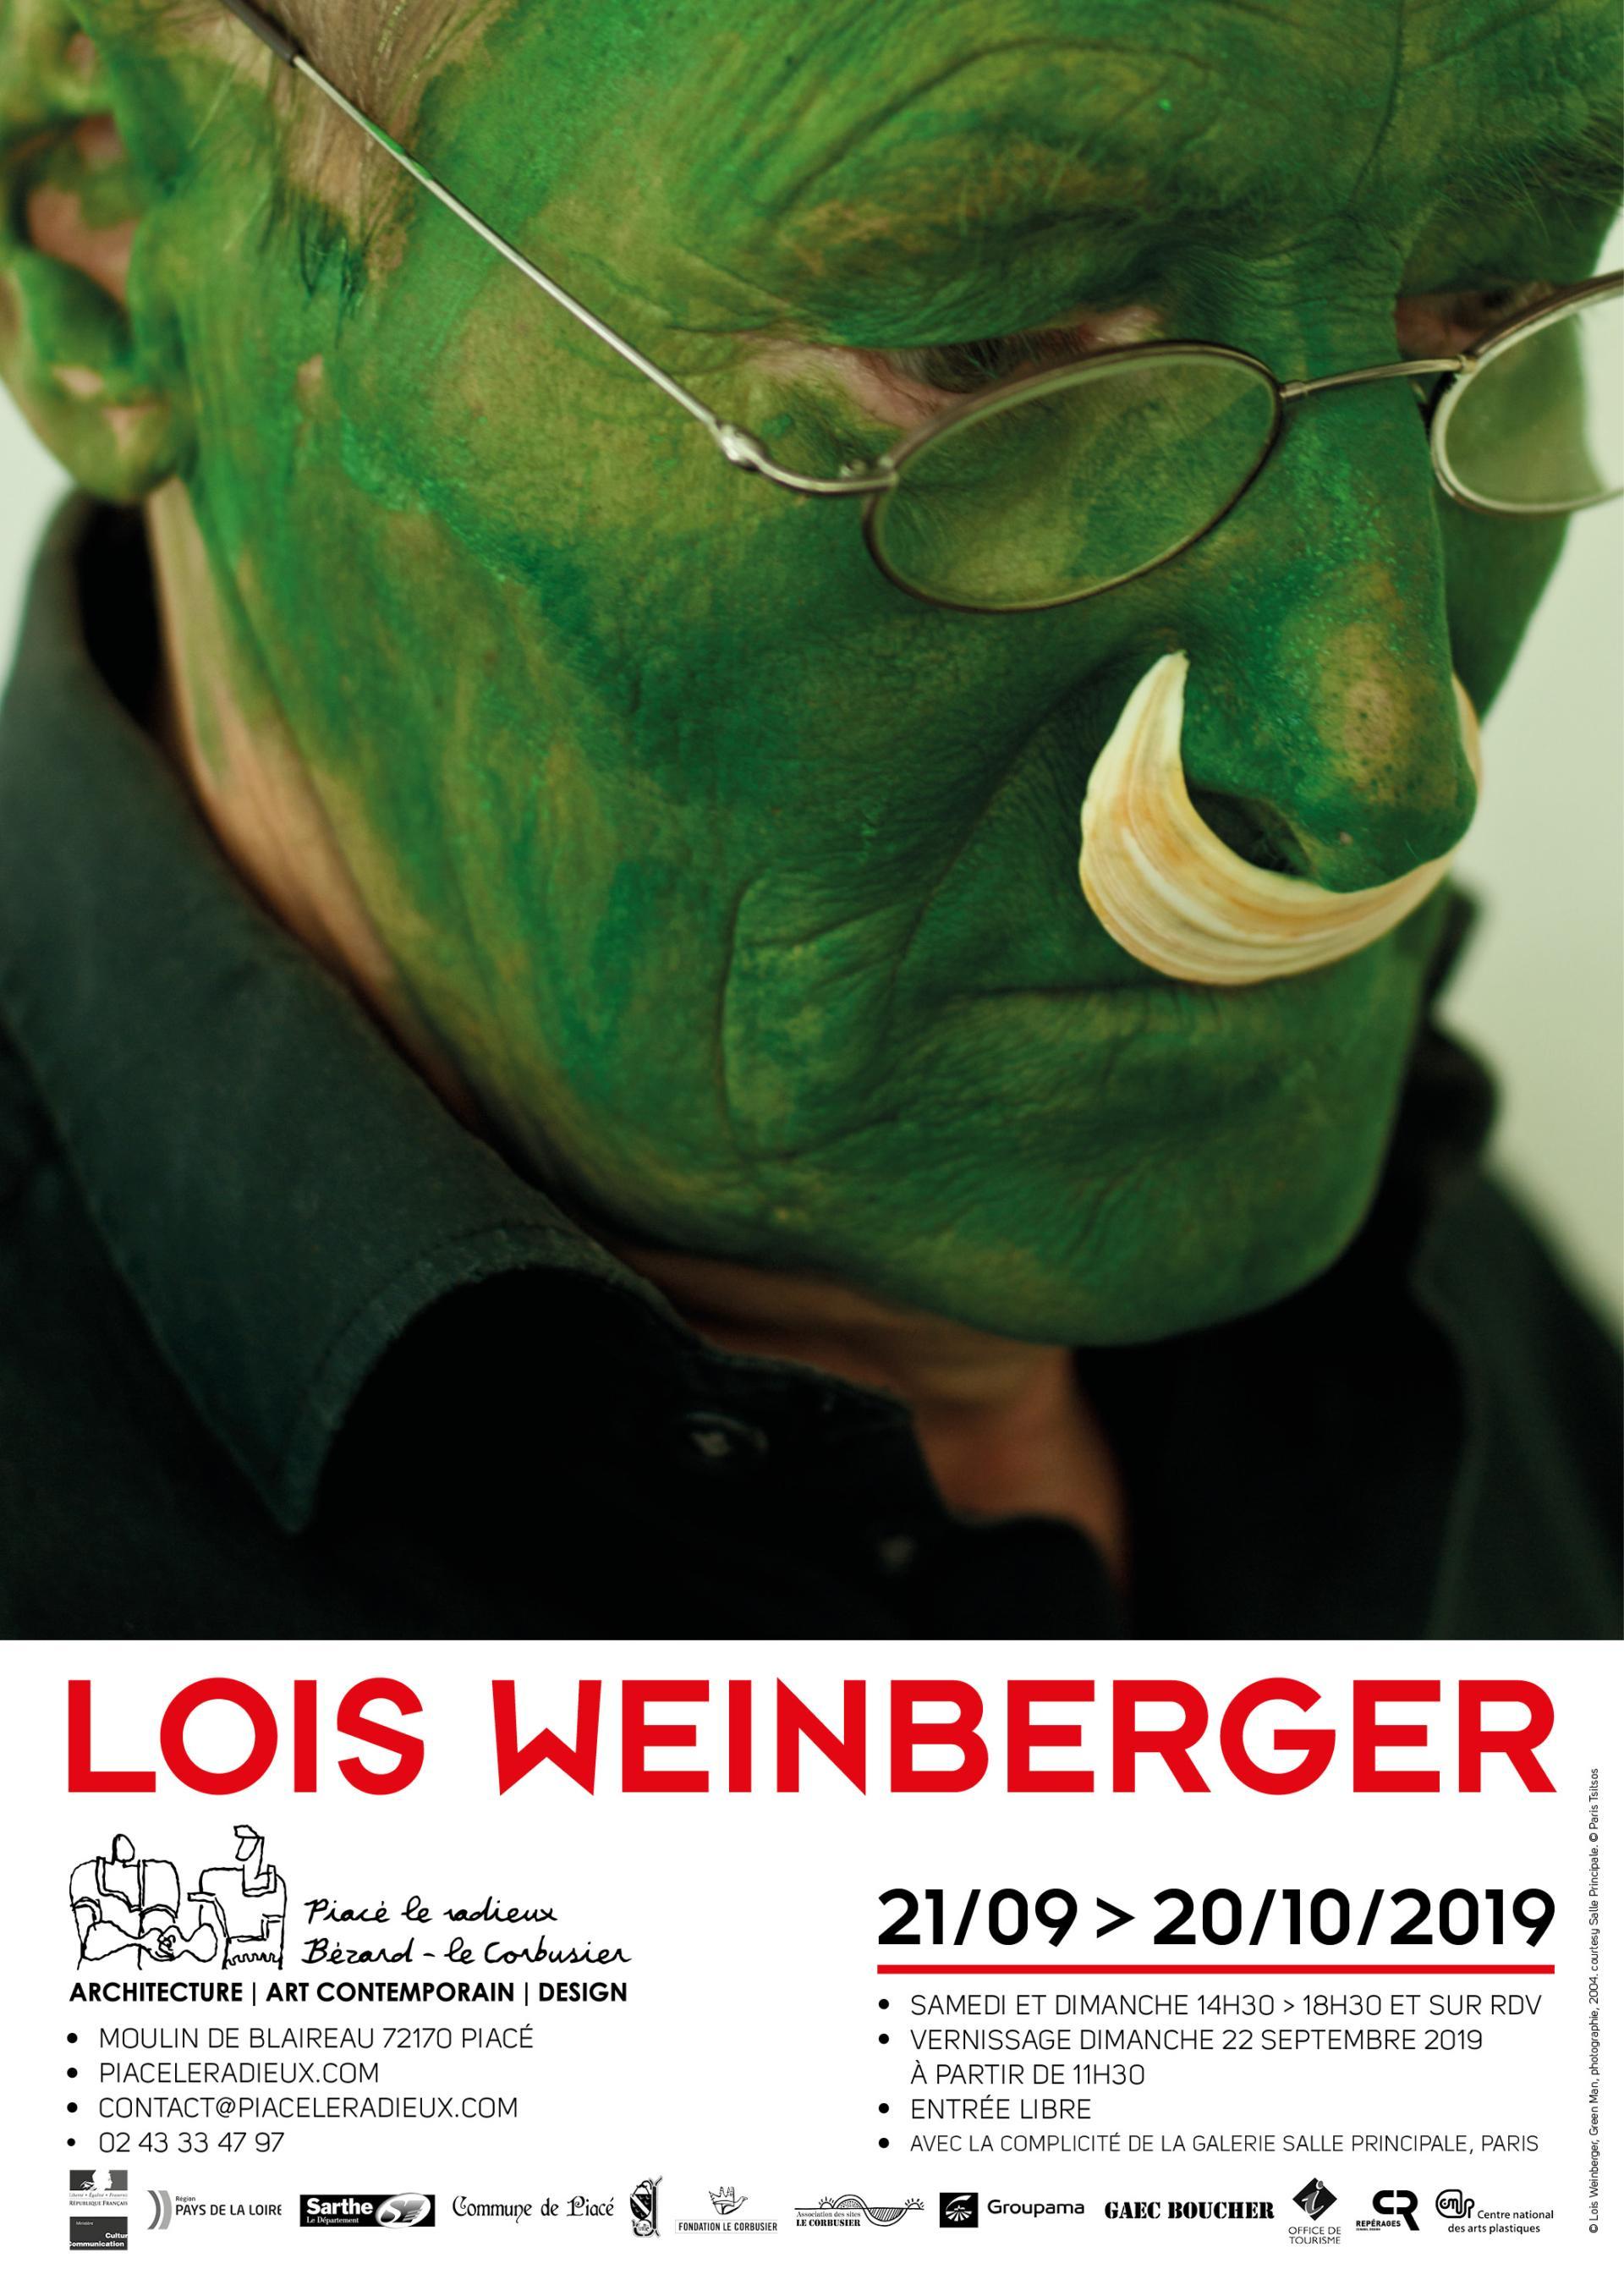 LoisWeinberger-Affiche